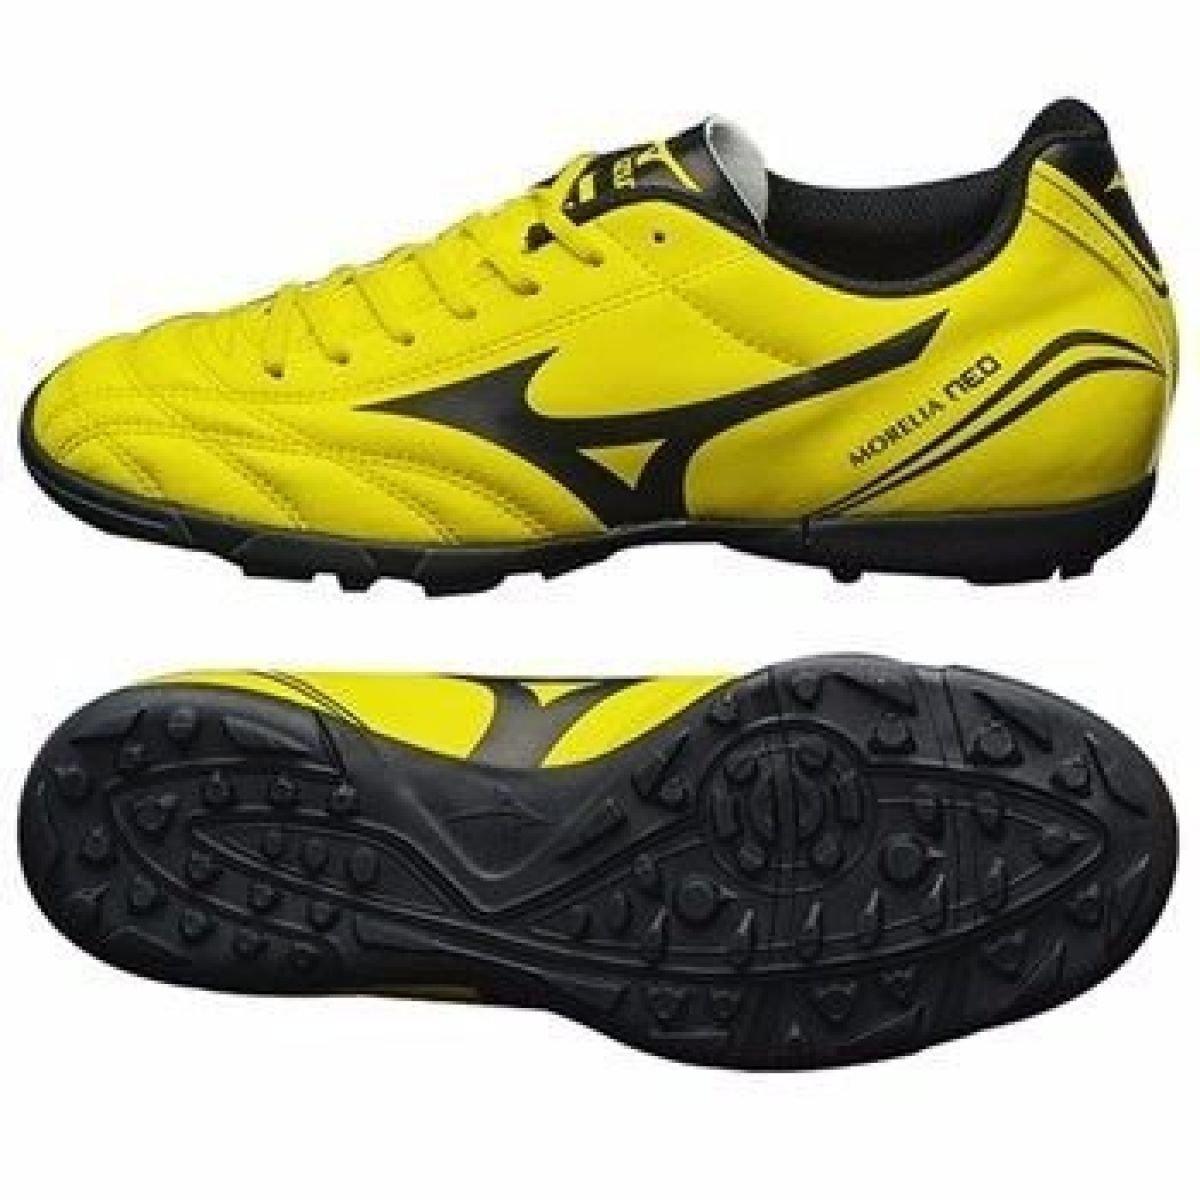 Chuteira Mizuno Morelia Neo Club - Amarelo e Preto - Compre Agora ... 405fd41554371